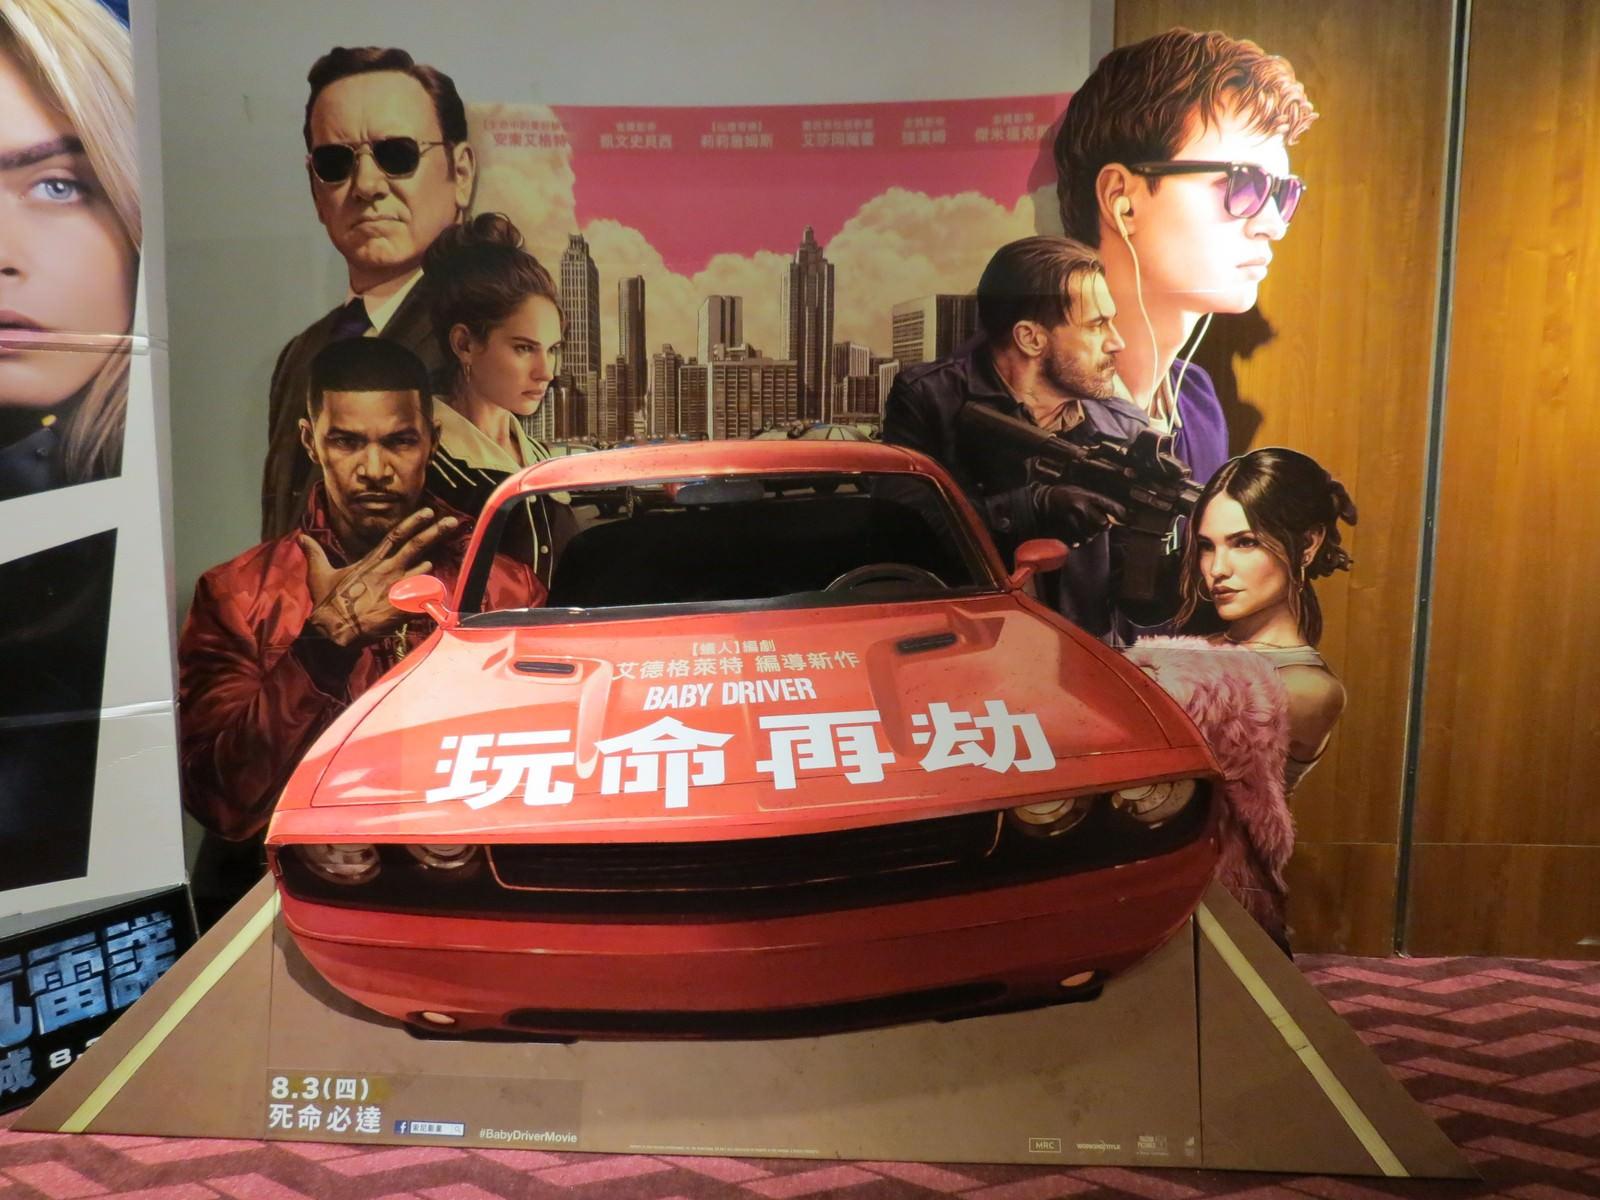 Movie, Baby Driver(美國, 2017年) / 玩命再劫(台灣) / 极盗车神(中國) / 寶貝車神(香港), 廣告看板, 欣欣秀泰影城